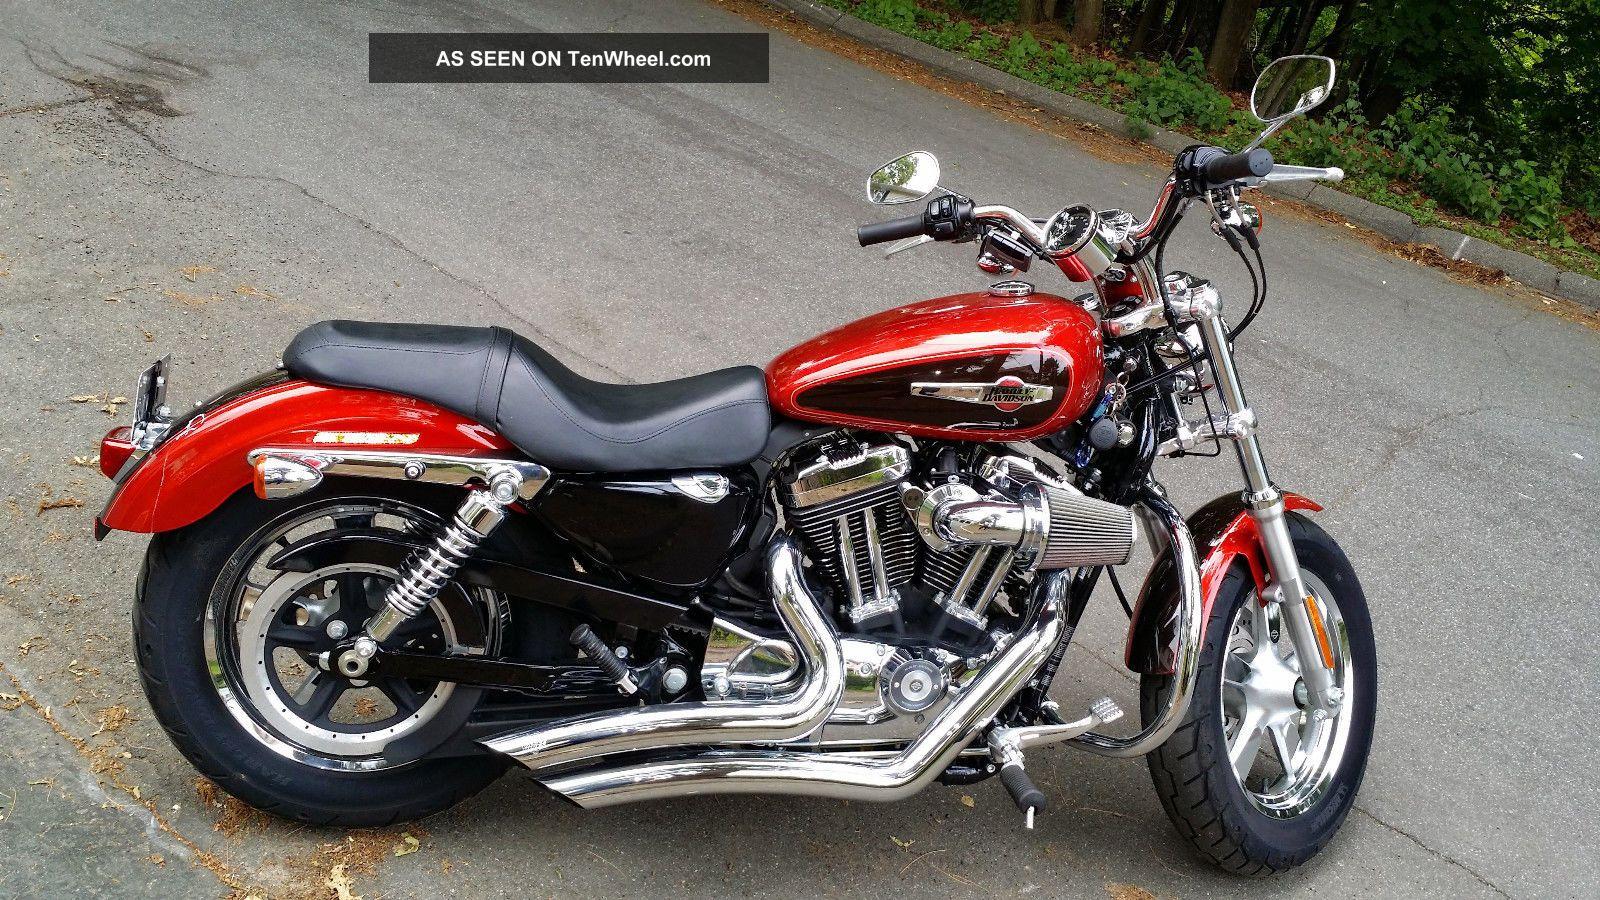 2013 Harley Davidson 1200 Sportster Custom